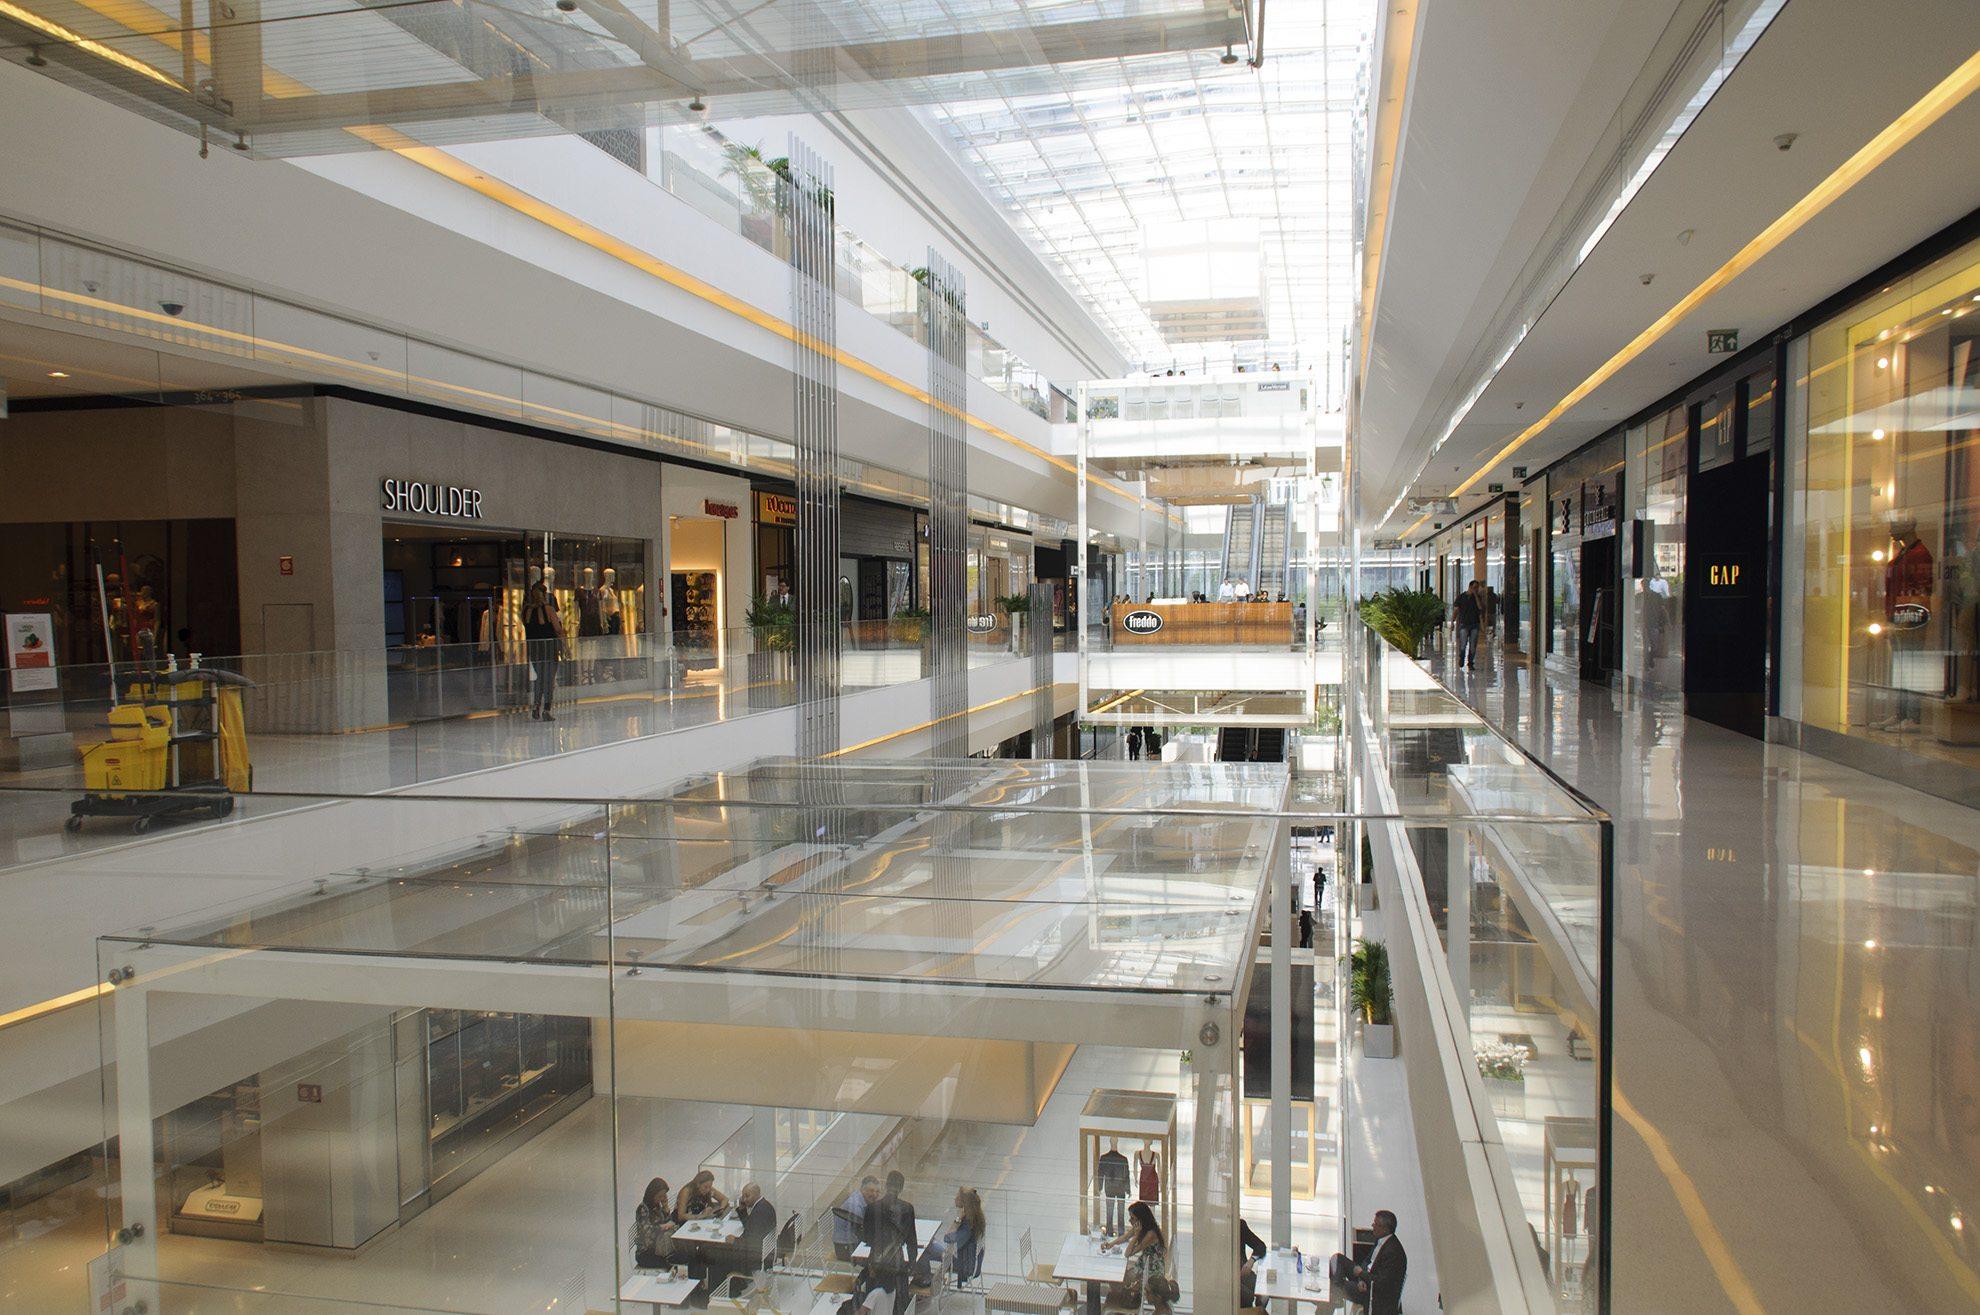 The Shopping JK Iguatemi mall in São Paulo, Brazil